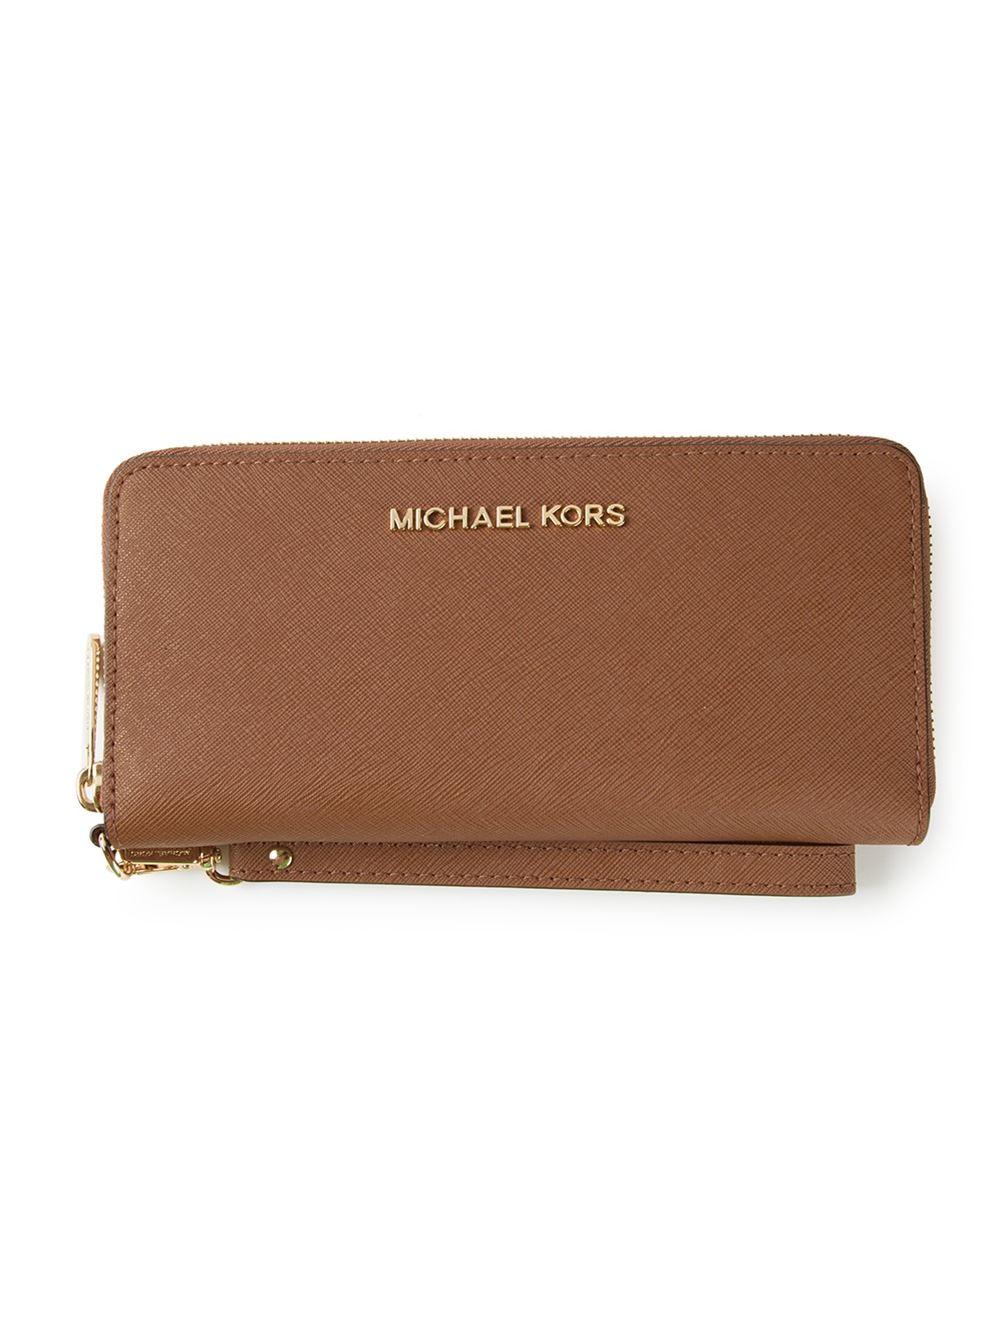 michael michael kors jet set wallet in brown lyst